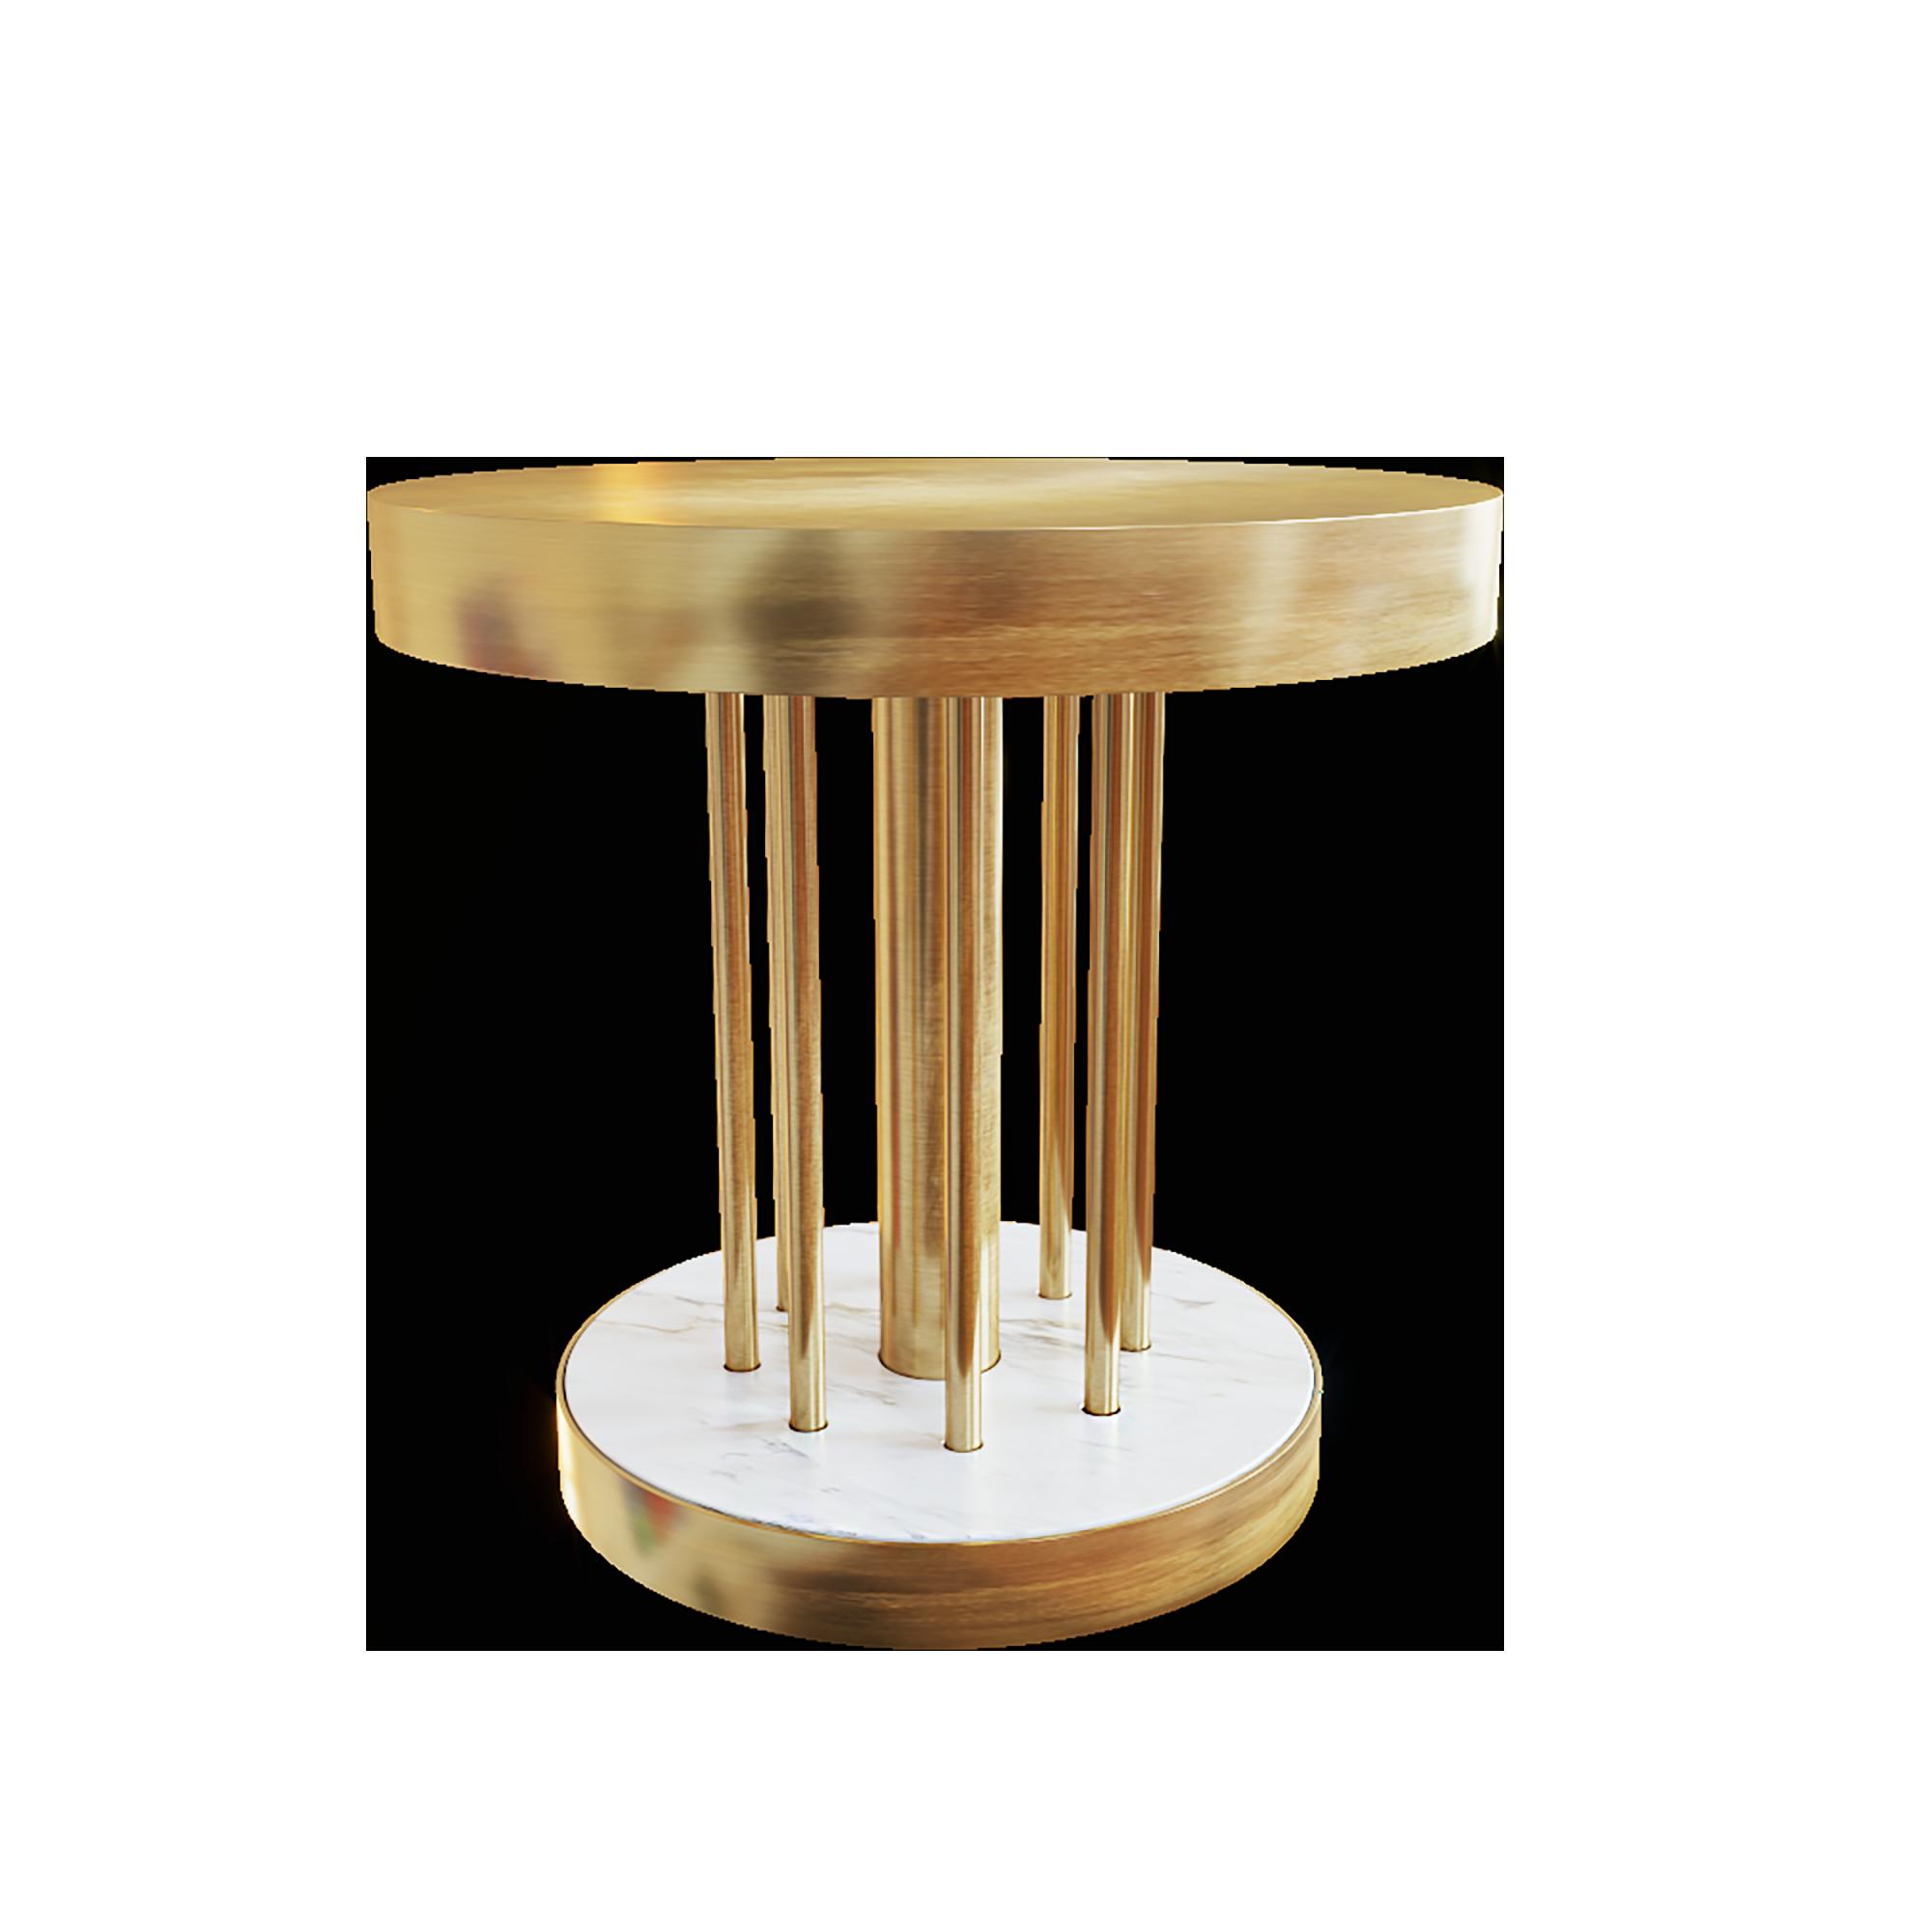 Журнальный столик Any-Home L020 - L020 | AnyHome.ru